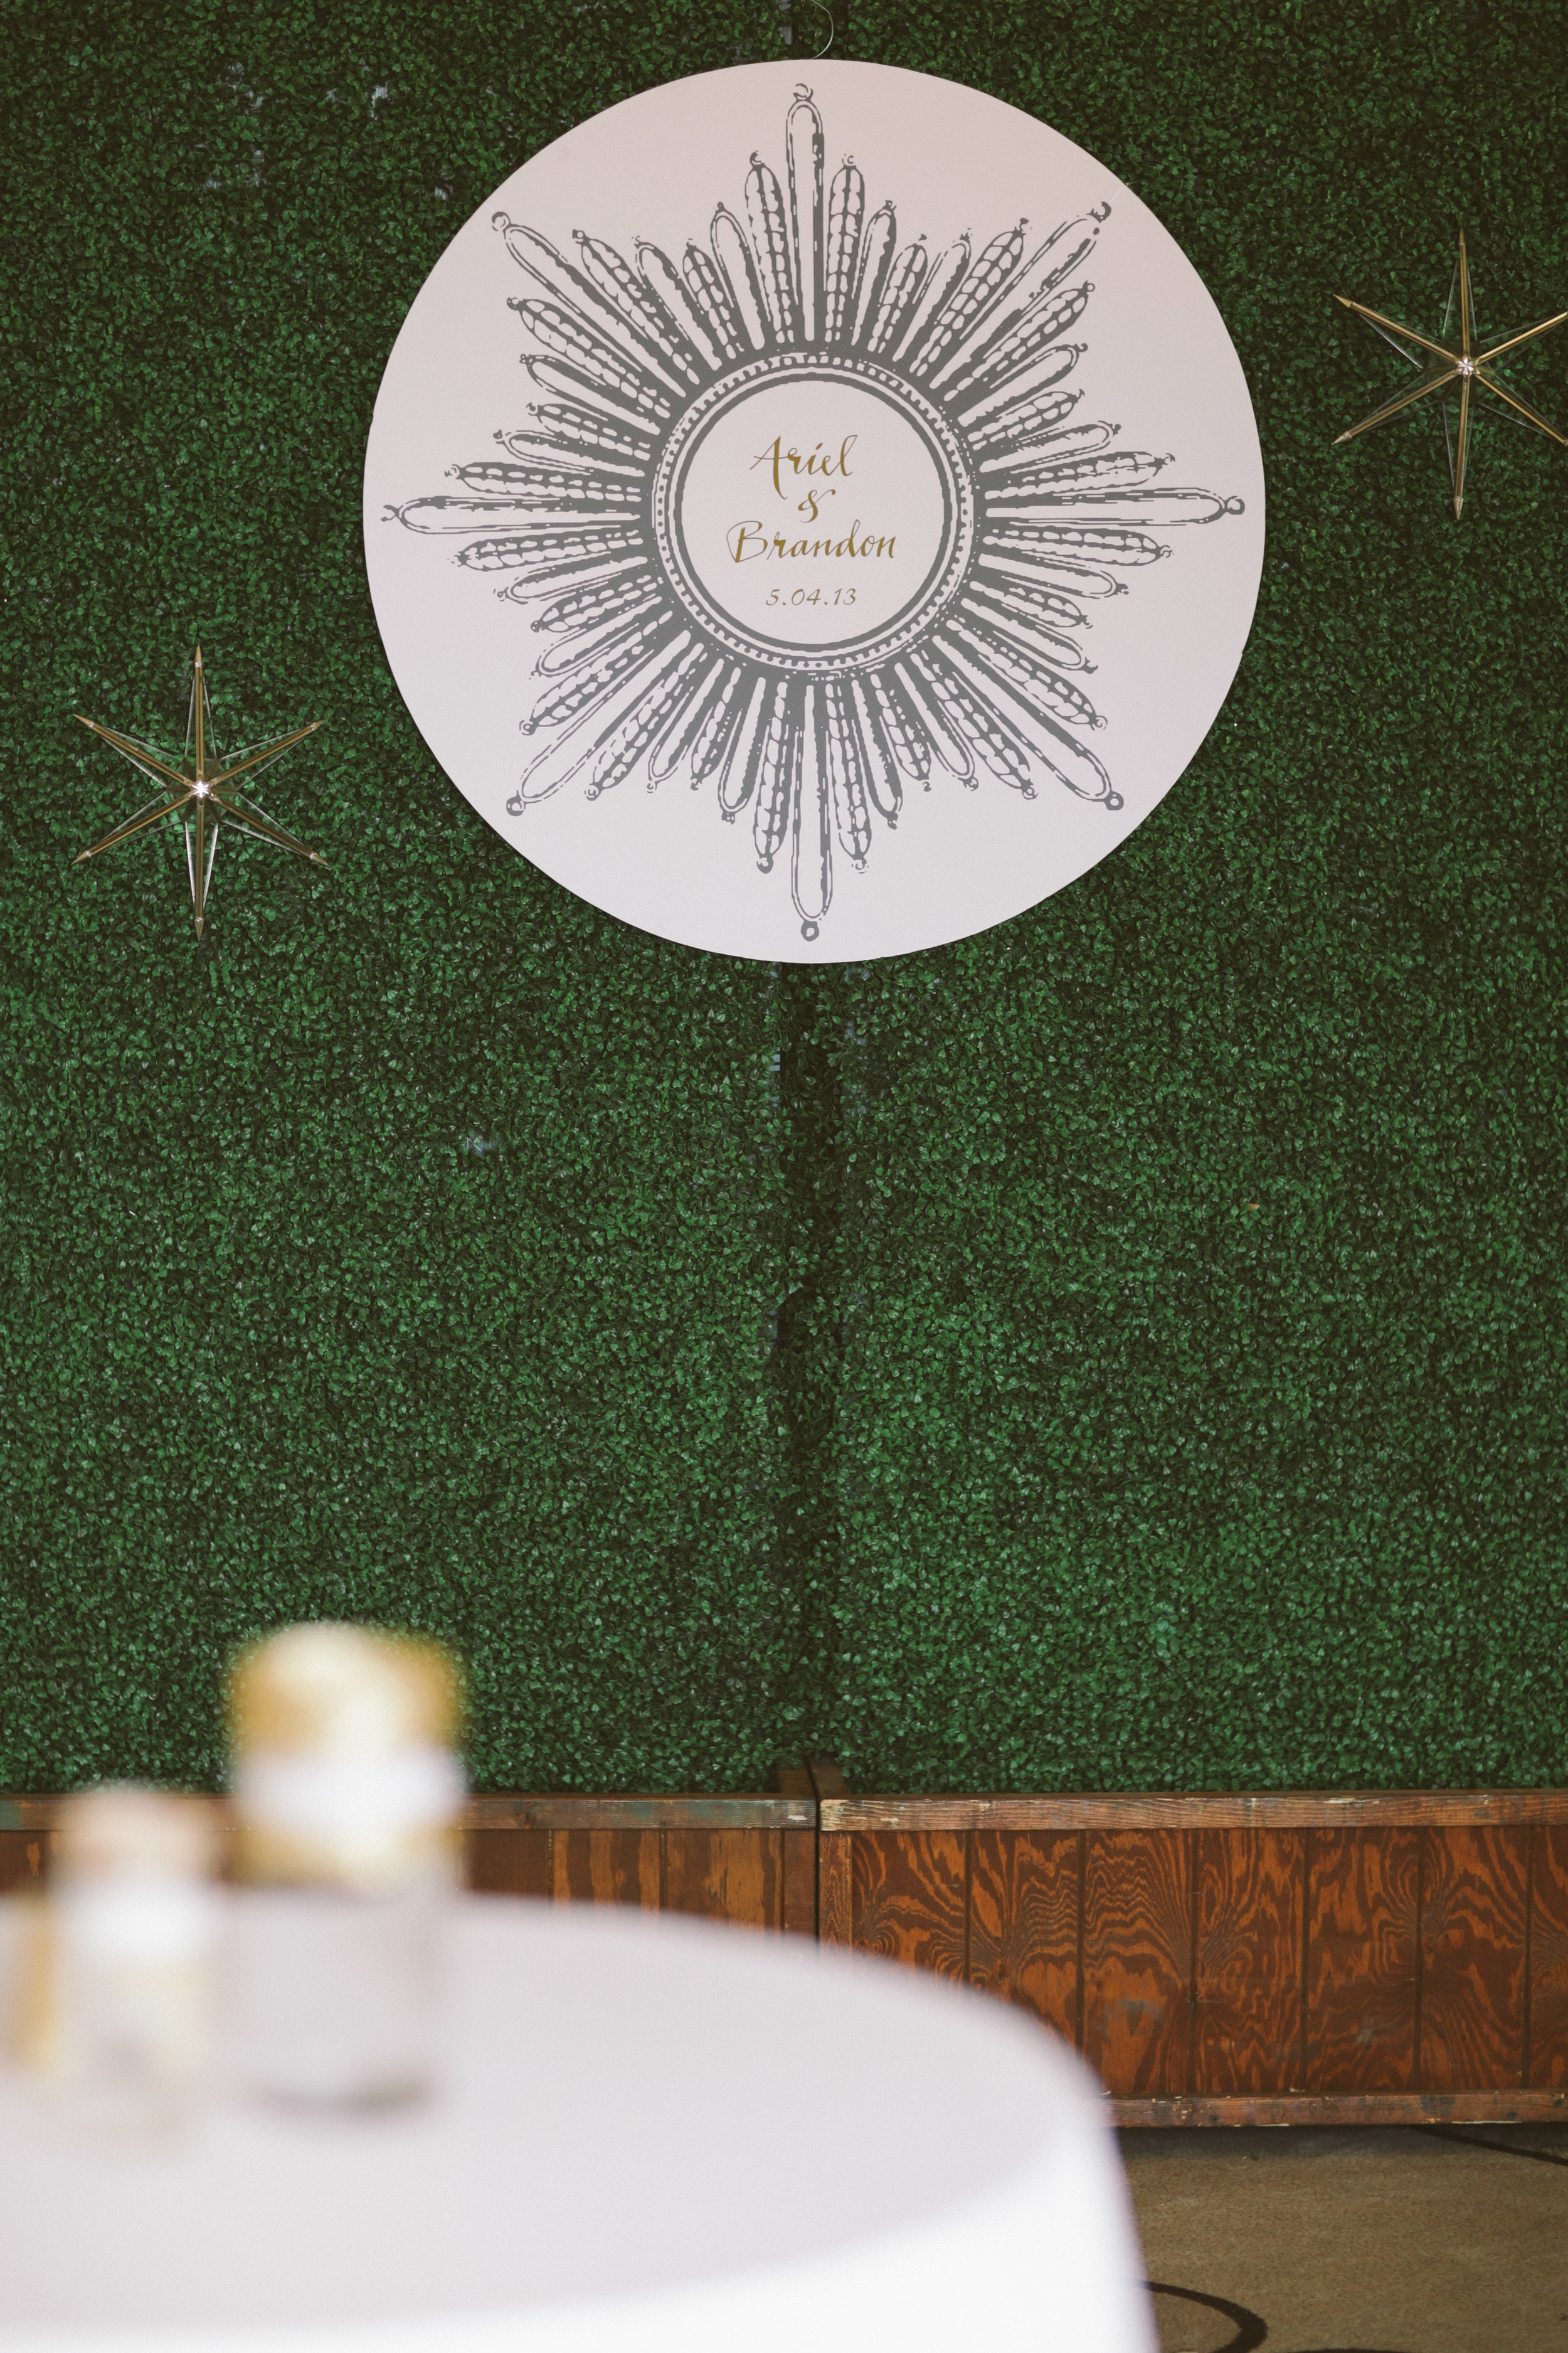 013 cocktail monogram.jpg